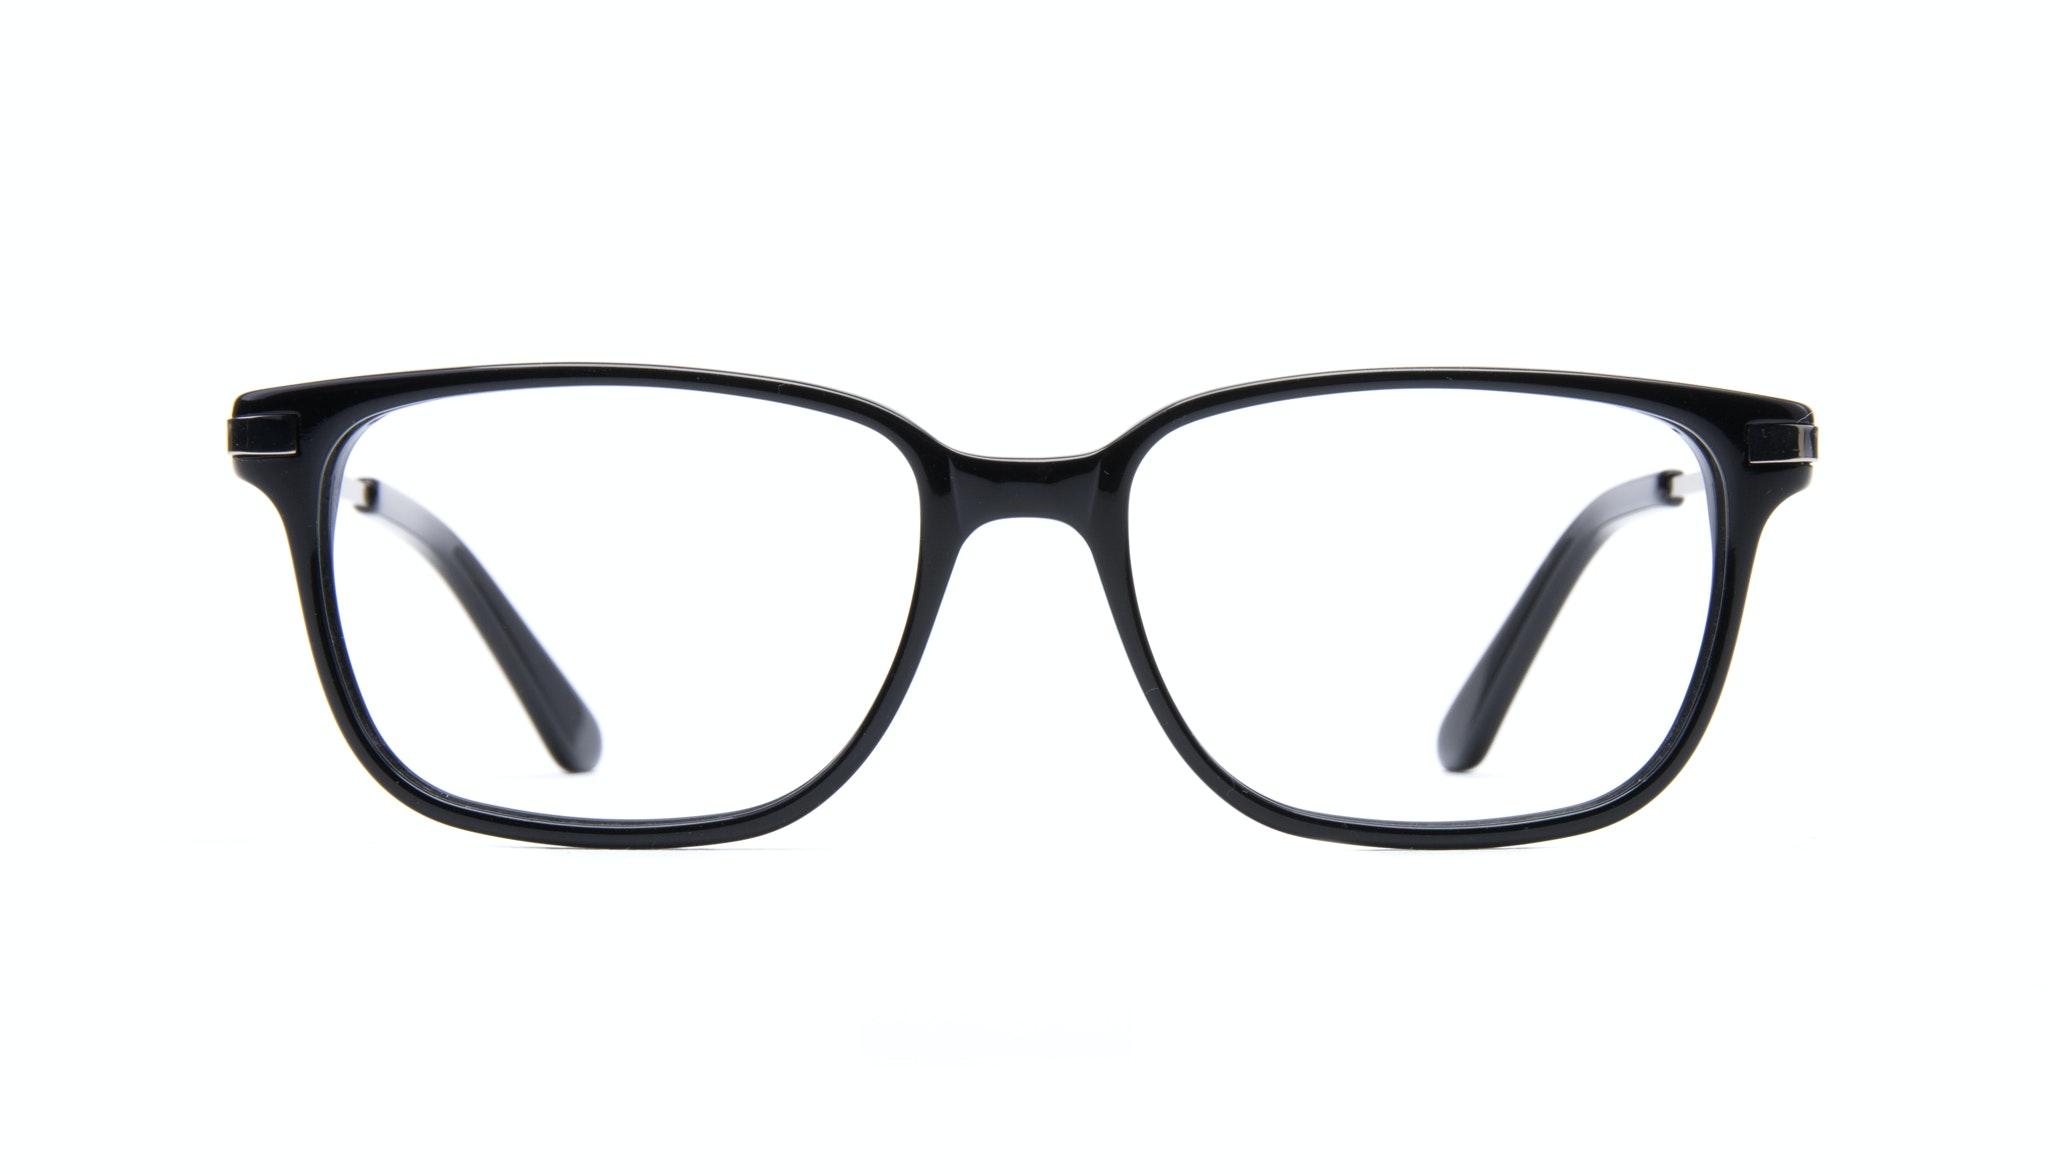 Affordable Fashion Glasses Rectangle Eyeglasses Men Trade Black